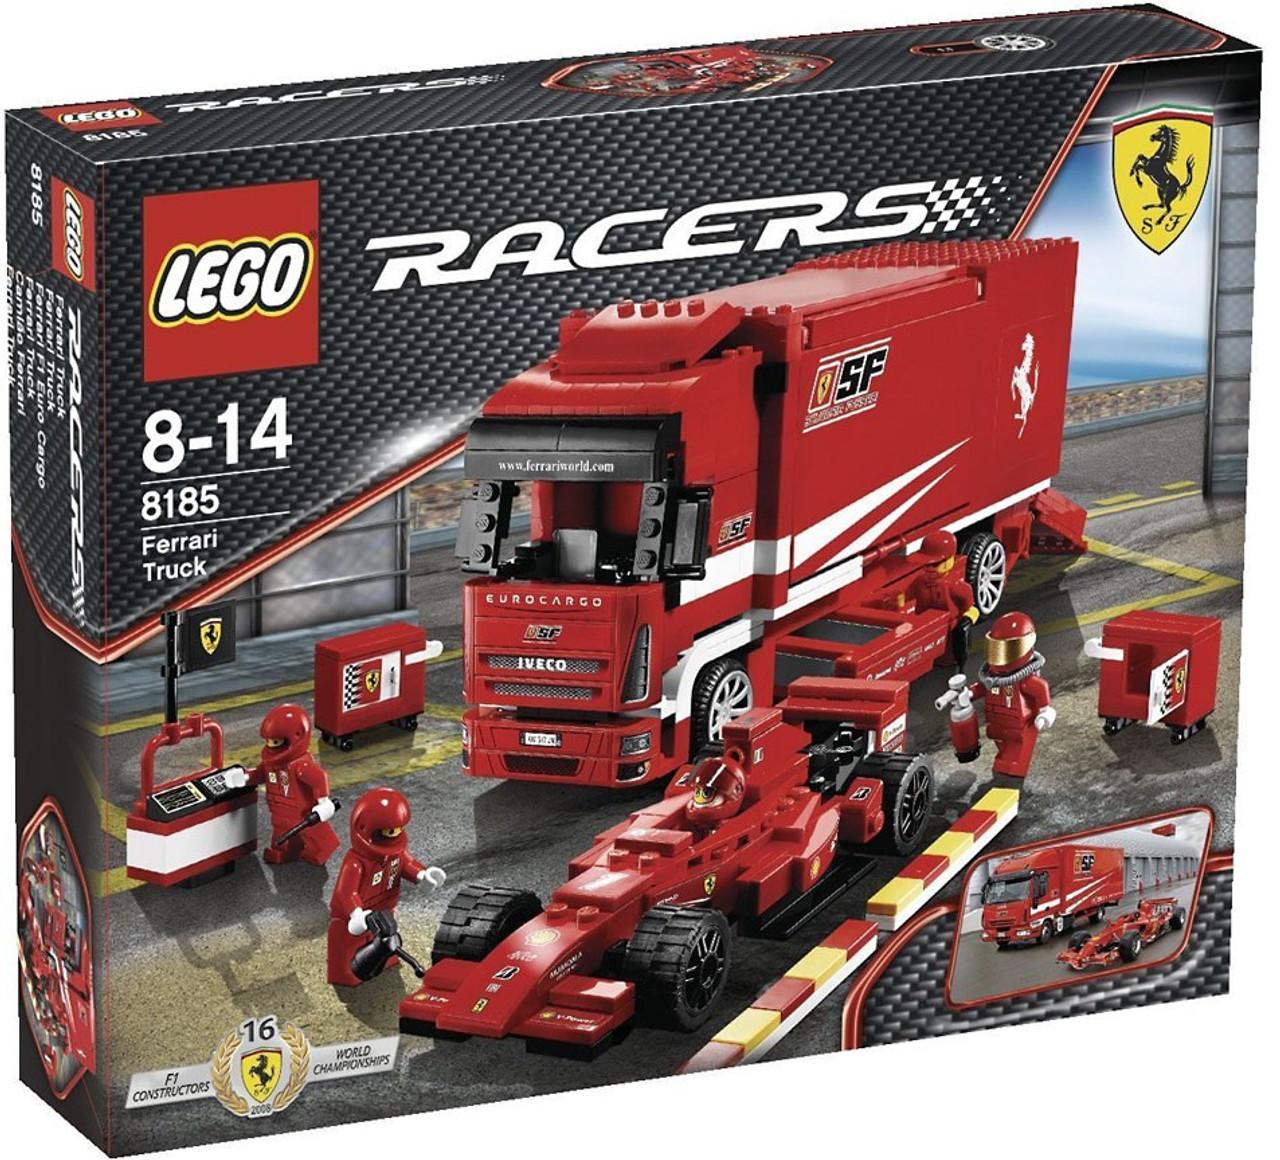 lego racers ferrari truck set 8185 toywiz. Black Bedroom Furniture Sets. Home Design Ideas